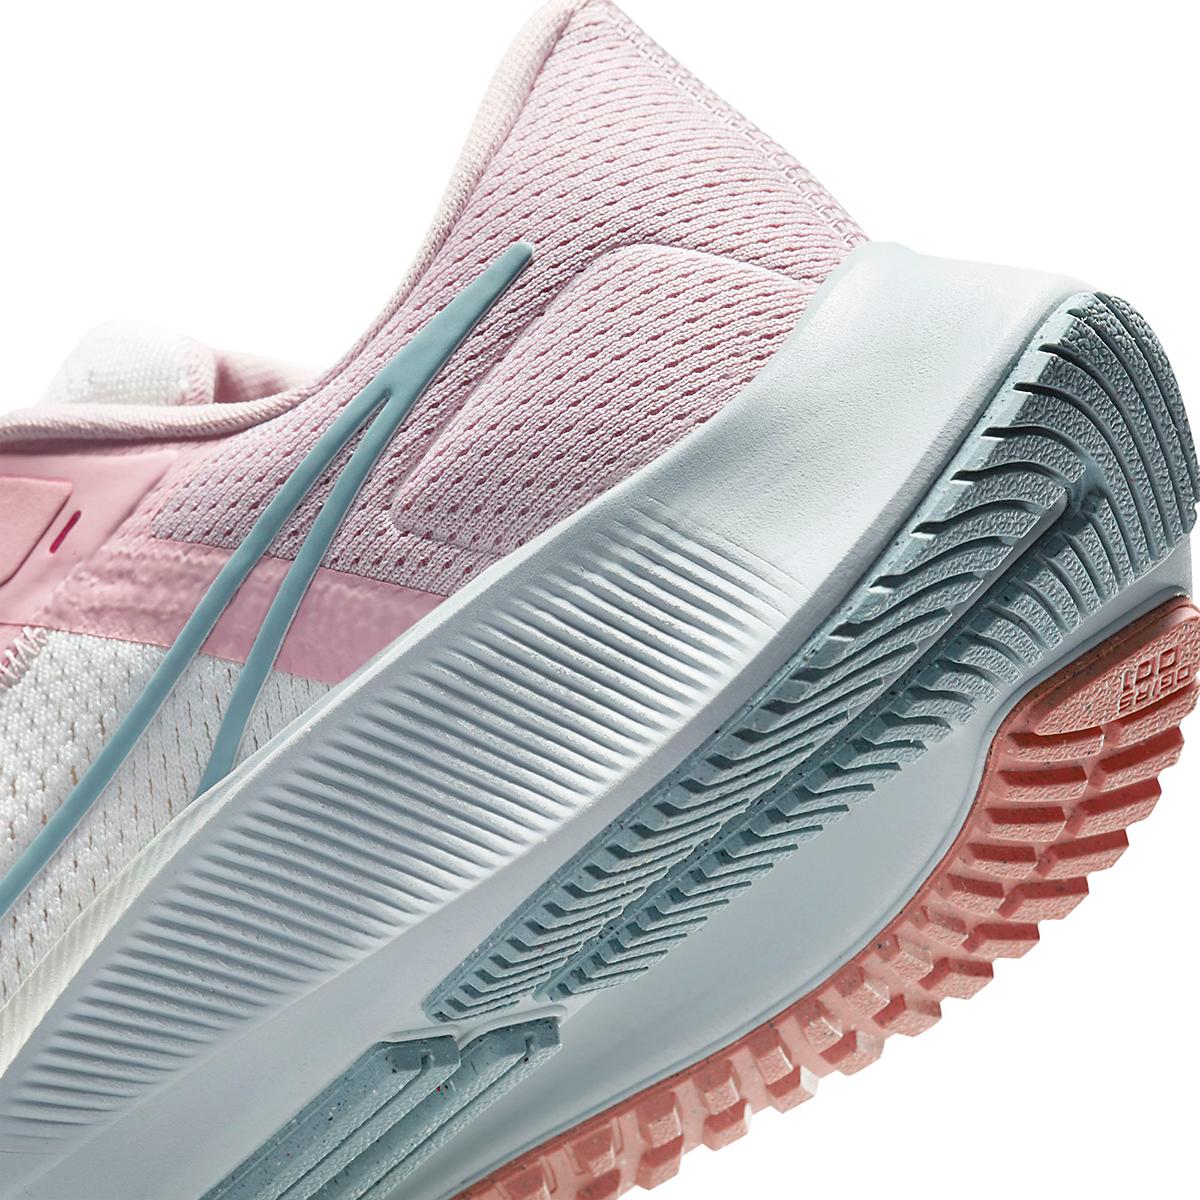 Women's Nike Air Zoom Pegasus 38 Running Shoe - Color: Sail/Ocean Cube/Pink Glaze/Crimson Bliss - Size: 5 - Width: Regular, Sail/Ocean Cube/Pink Glaze/Crimson Bliss, large, image 5